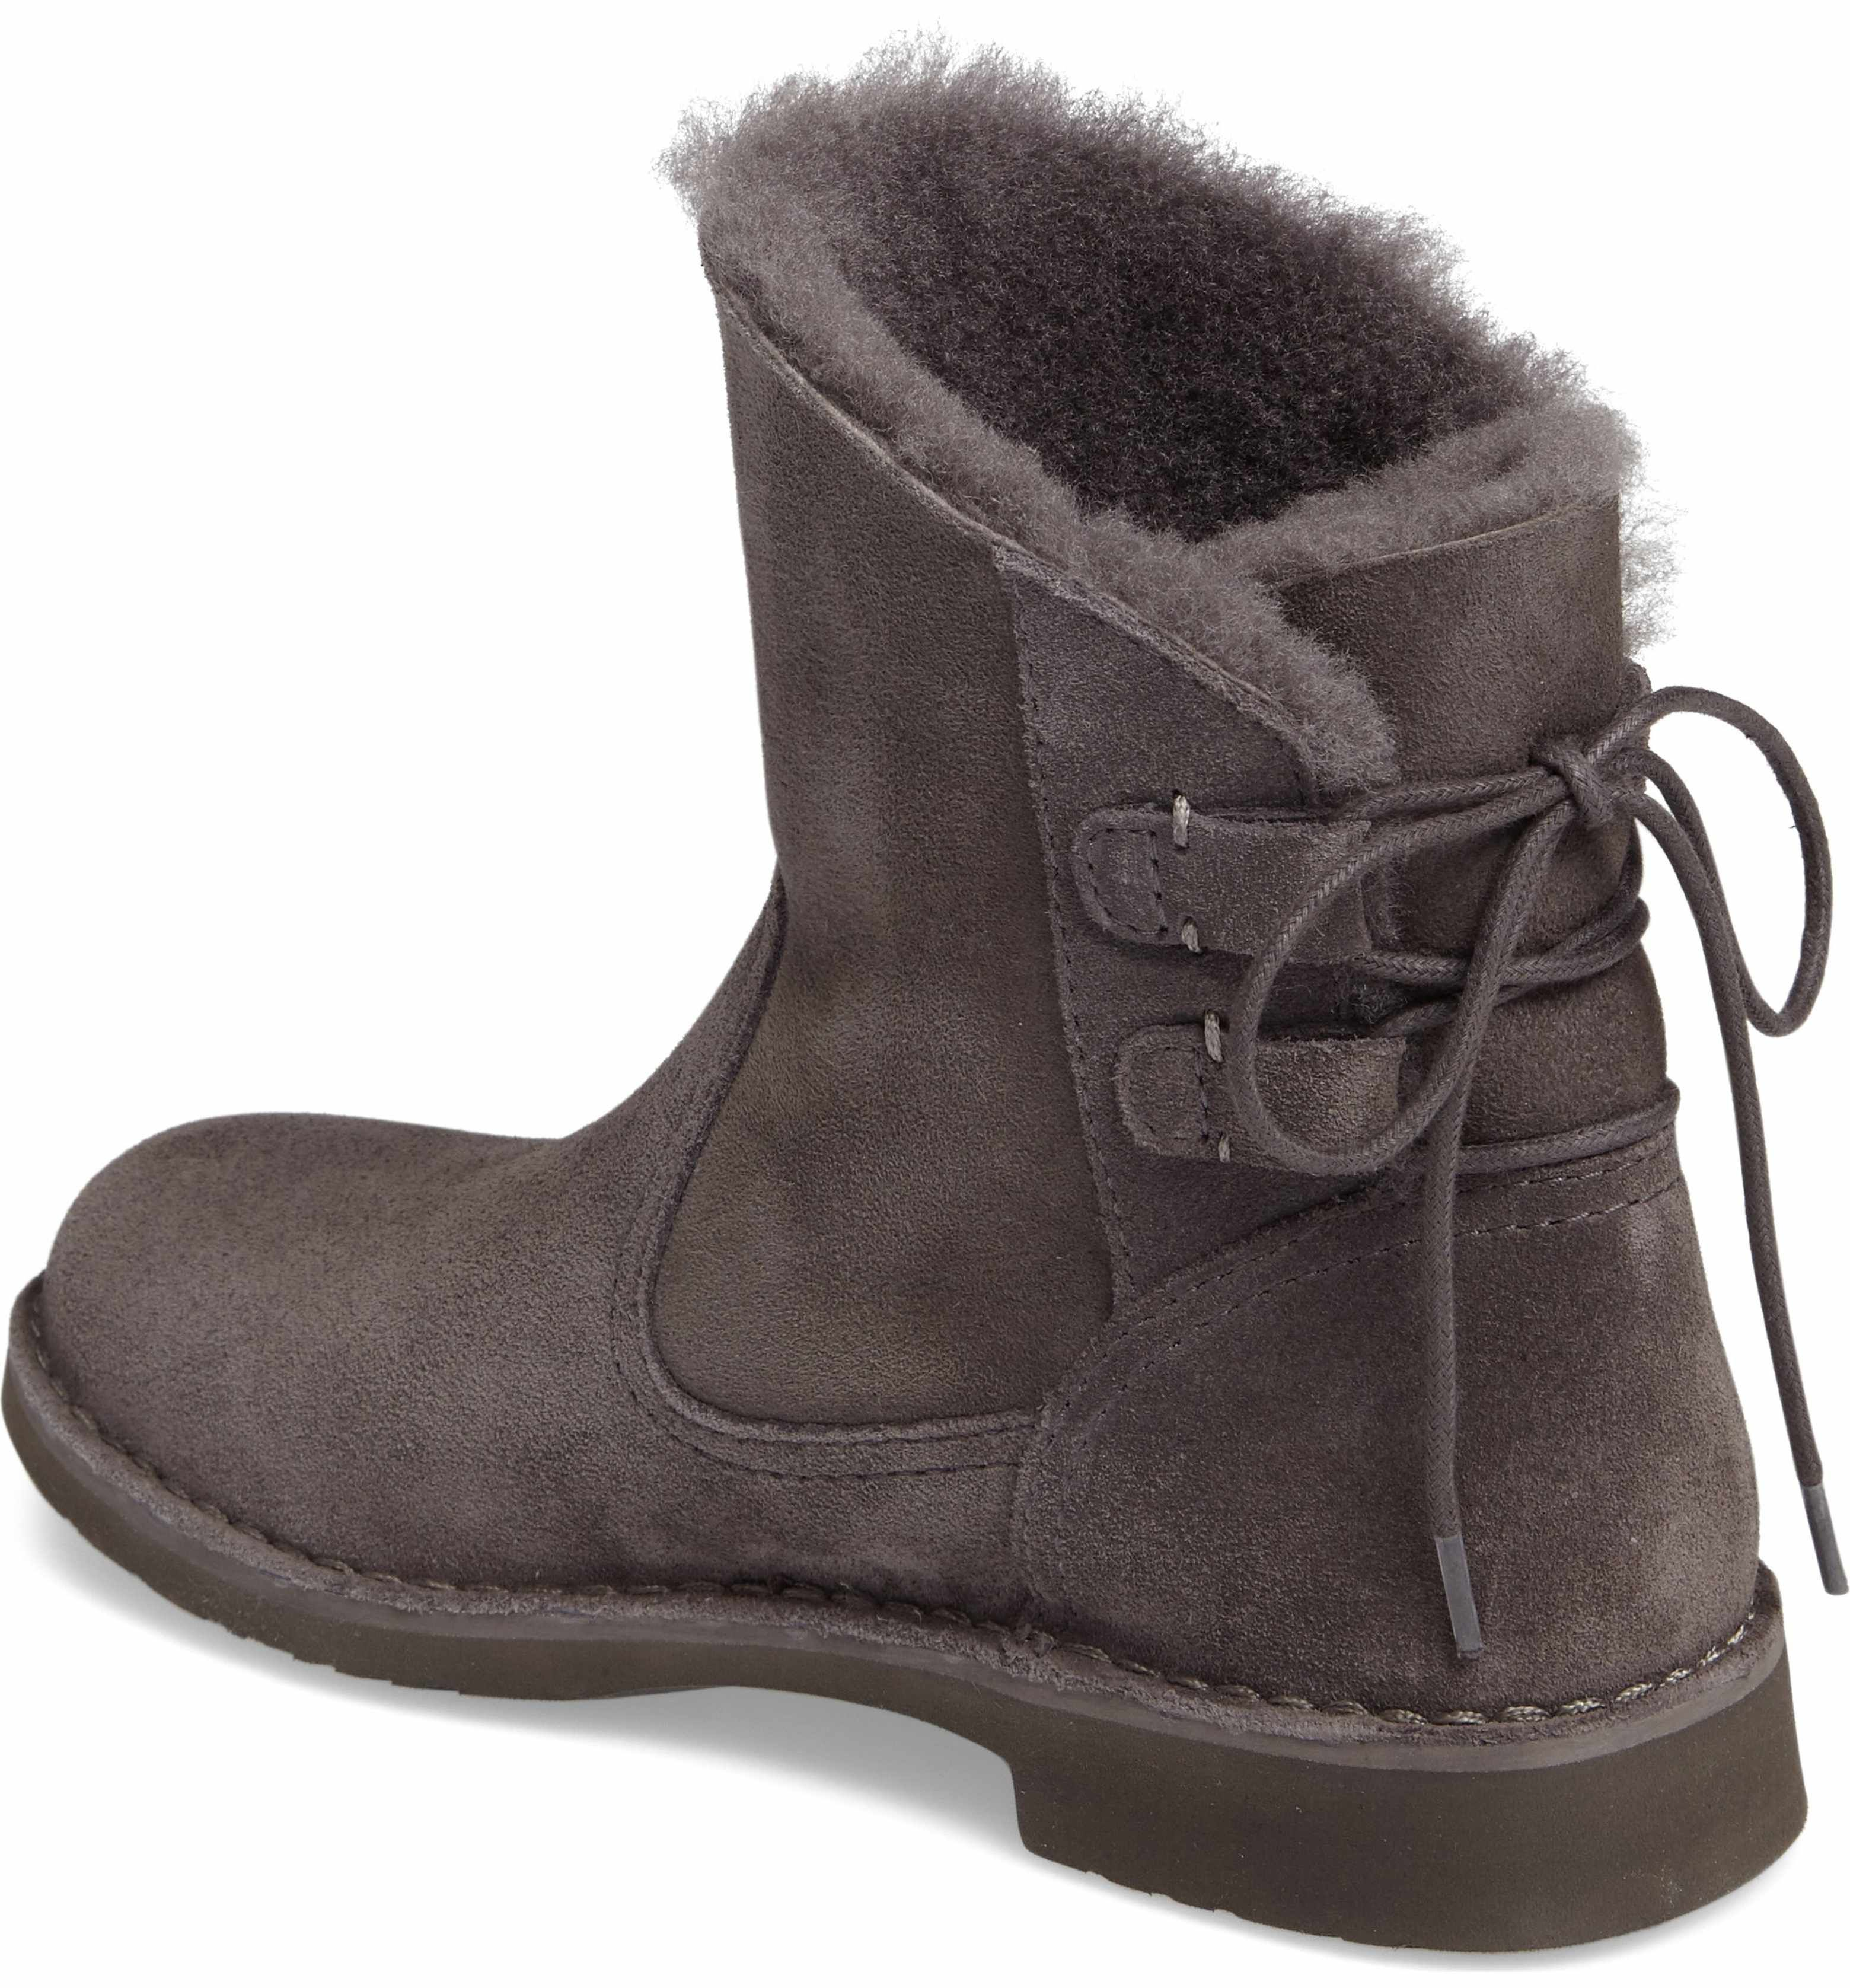 2f3c882d5d2 Main Image - UGG® Naiyah Lace-Back Genuine Shearling Boot (Women ...